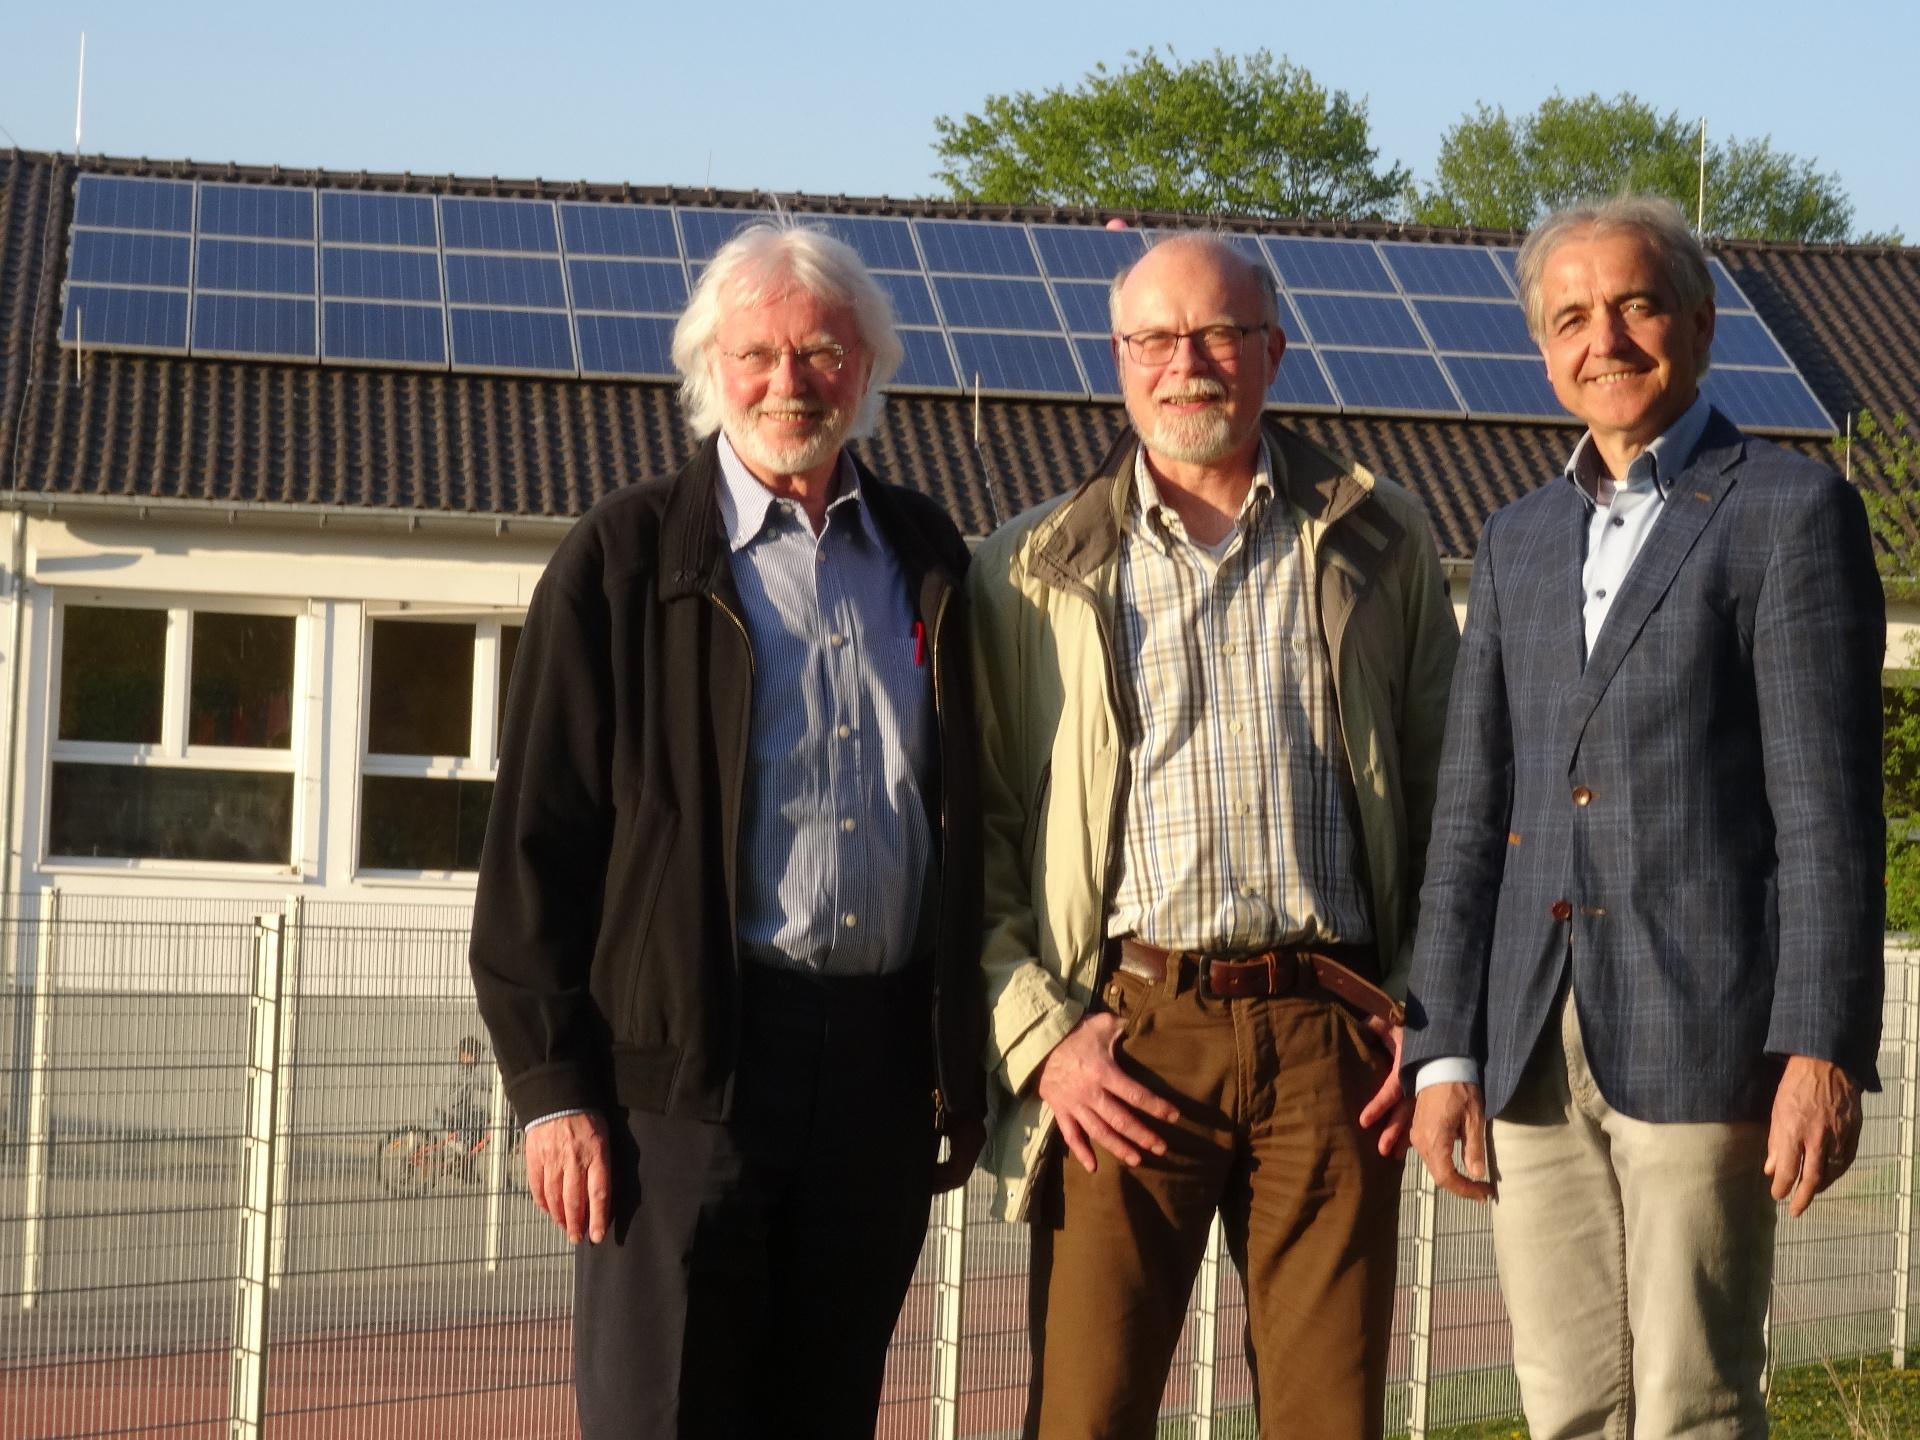 FWG-Kreis-Ahrweiler-Kreistag-Kandidaten-Solarverein-2019